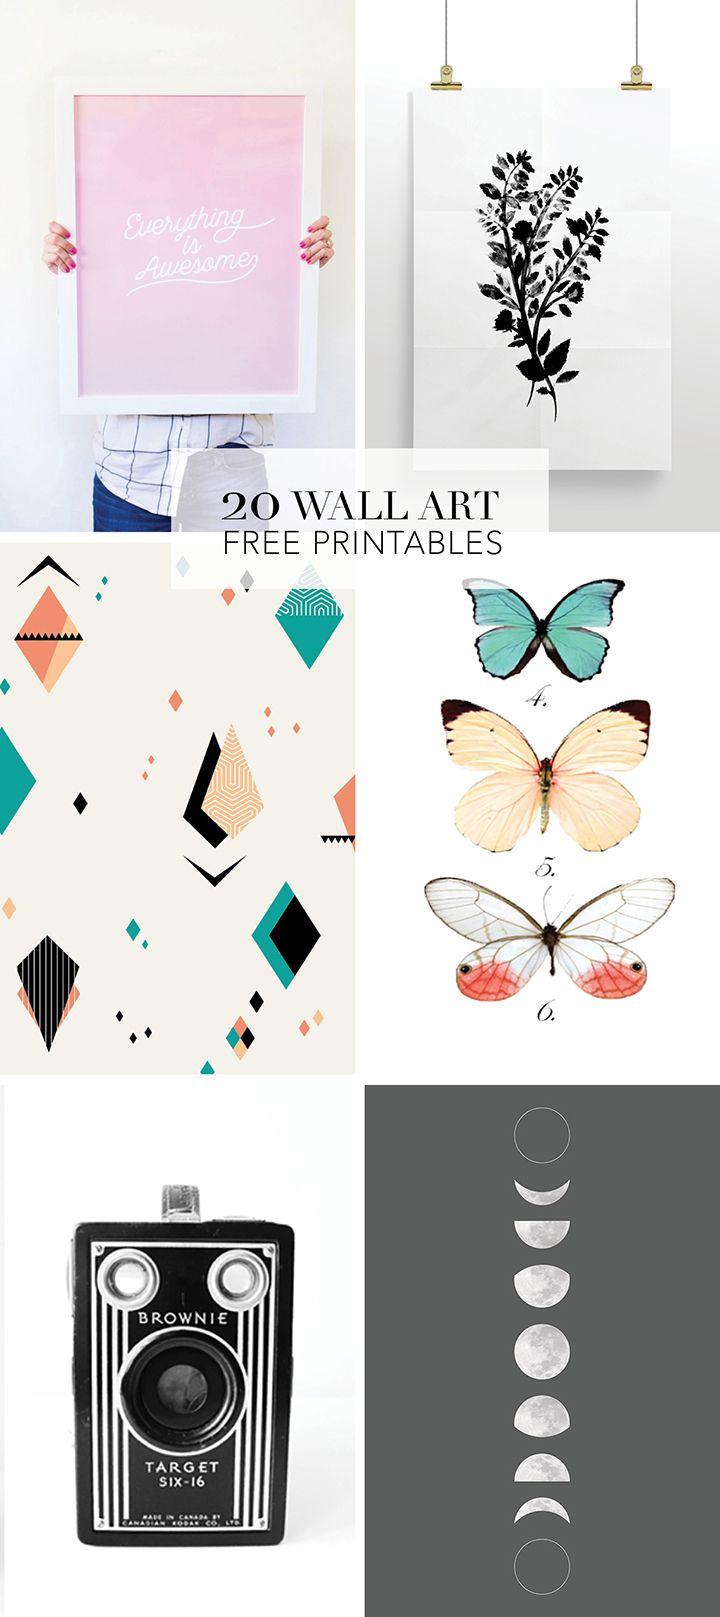 20 favorite wall art free printables | diy wall decor | pinterest